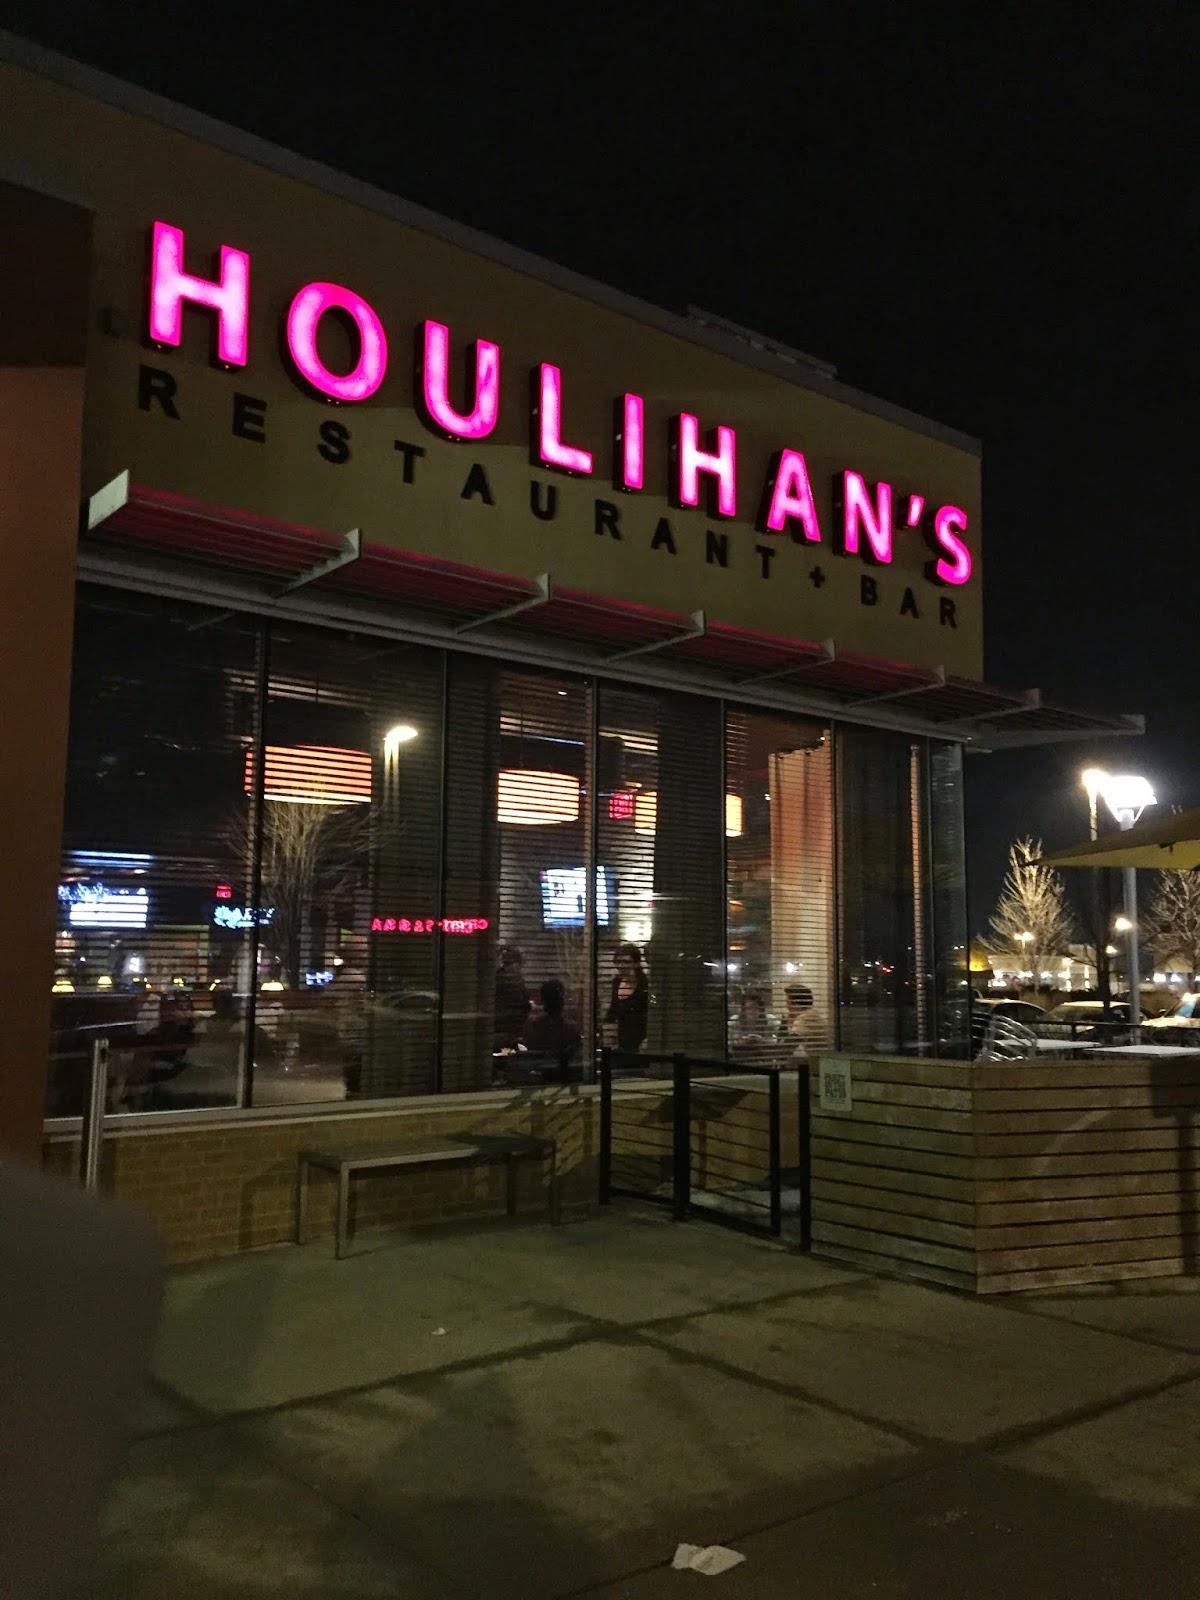 Rhetoric Rock Stars: Houlihans Restaurant and Bar